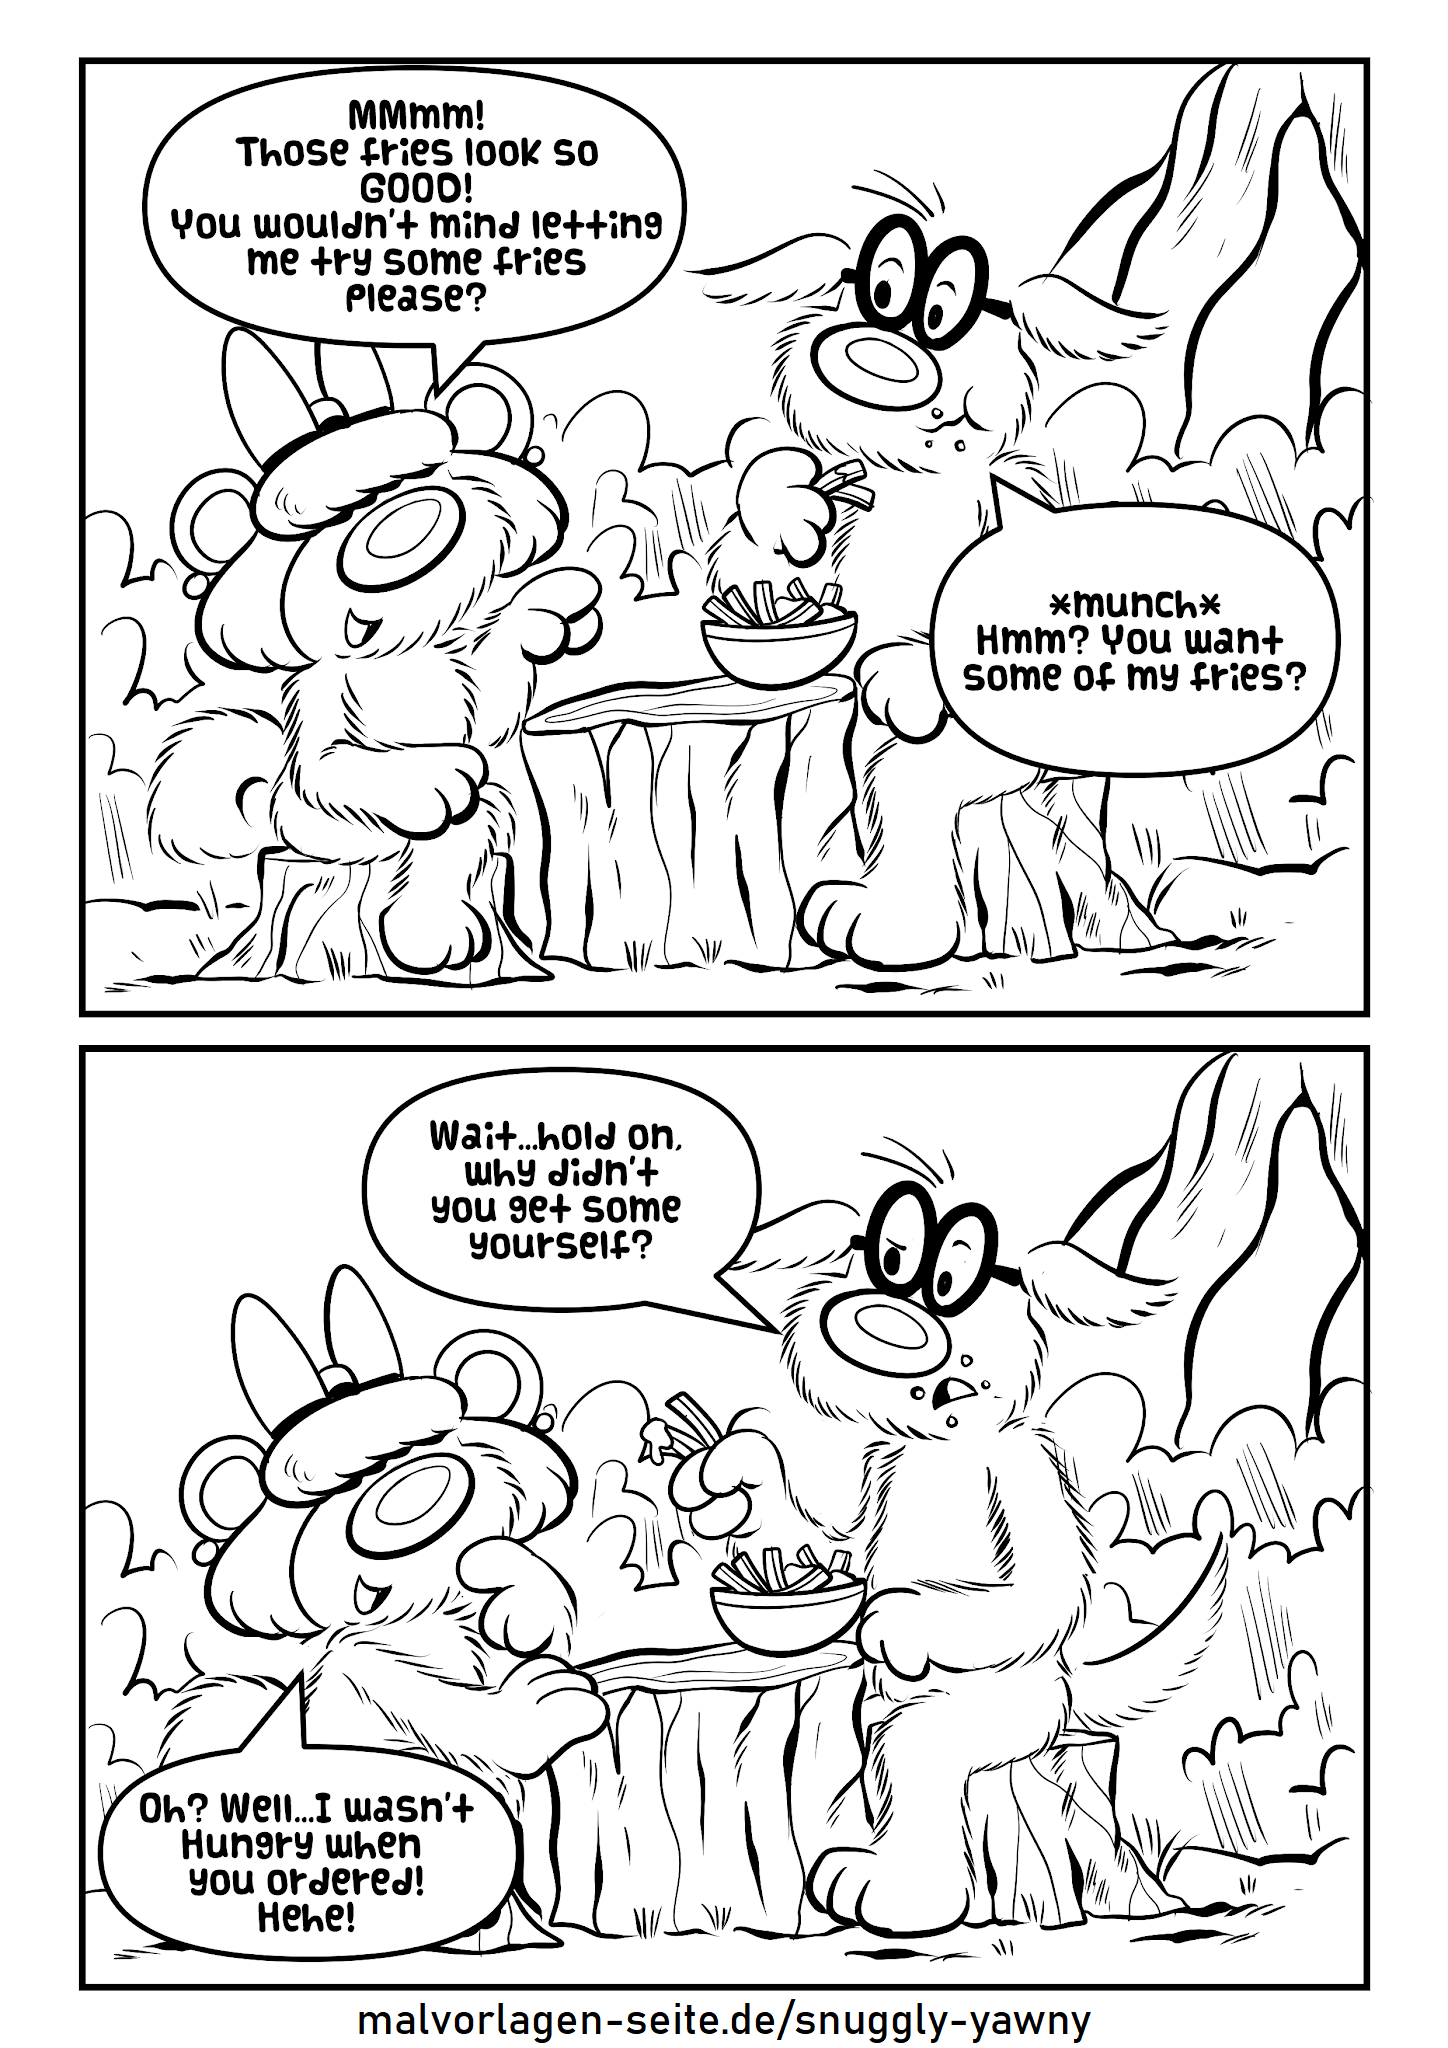 Snuggly و Yawny و سفارش سیب زمینی سرخ کرده